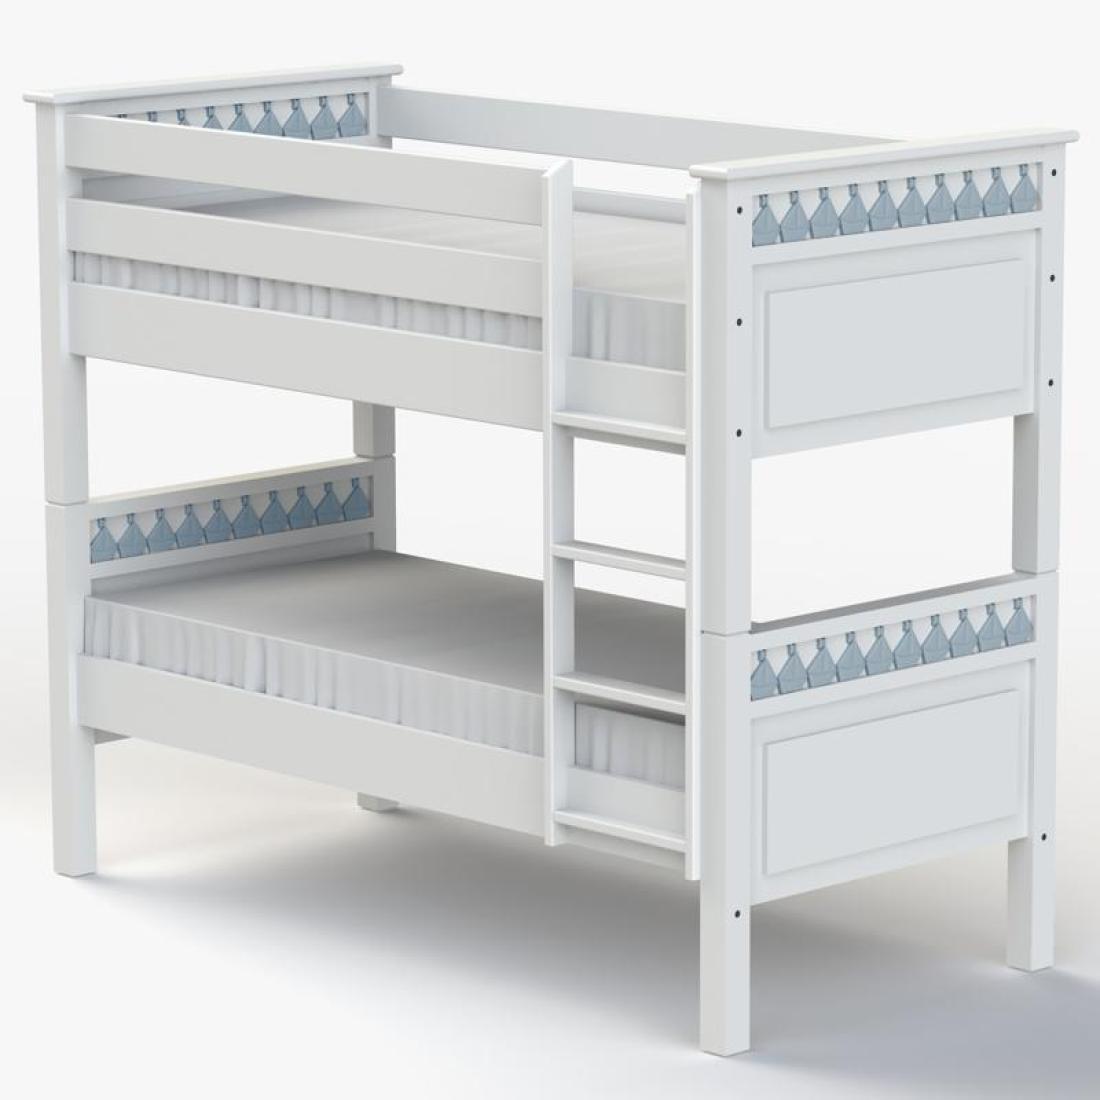 Little Buoy Blue Bunk Bed Boys Bunk Bed Kids Bunk Beds